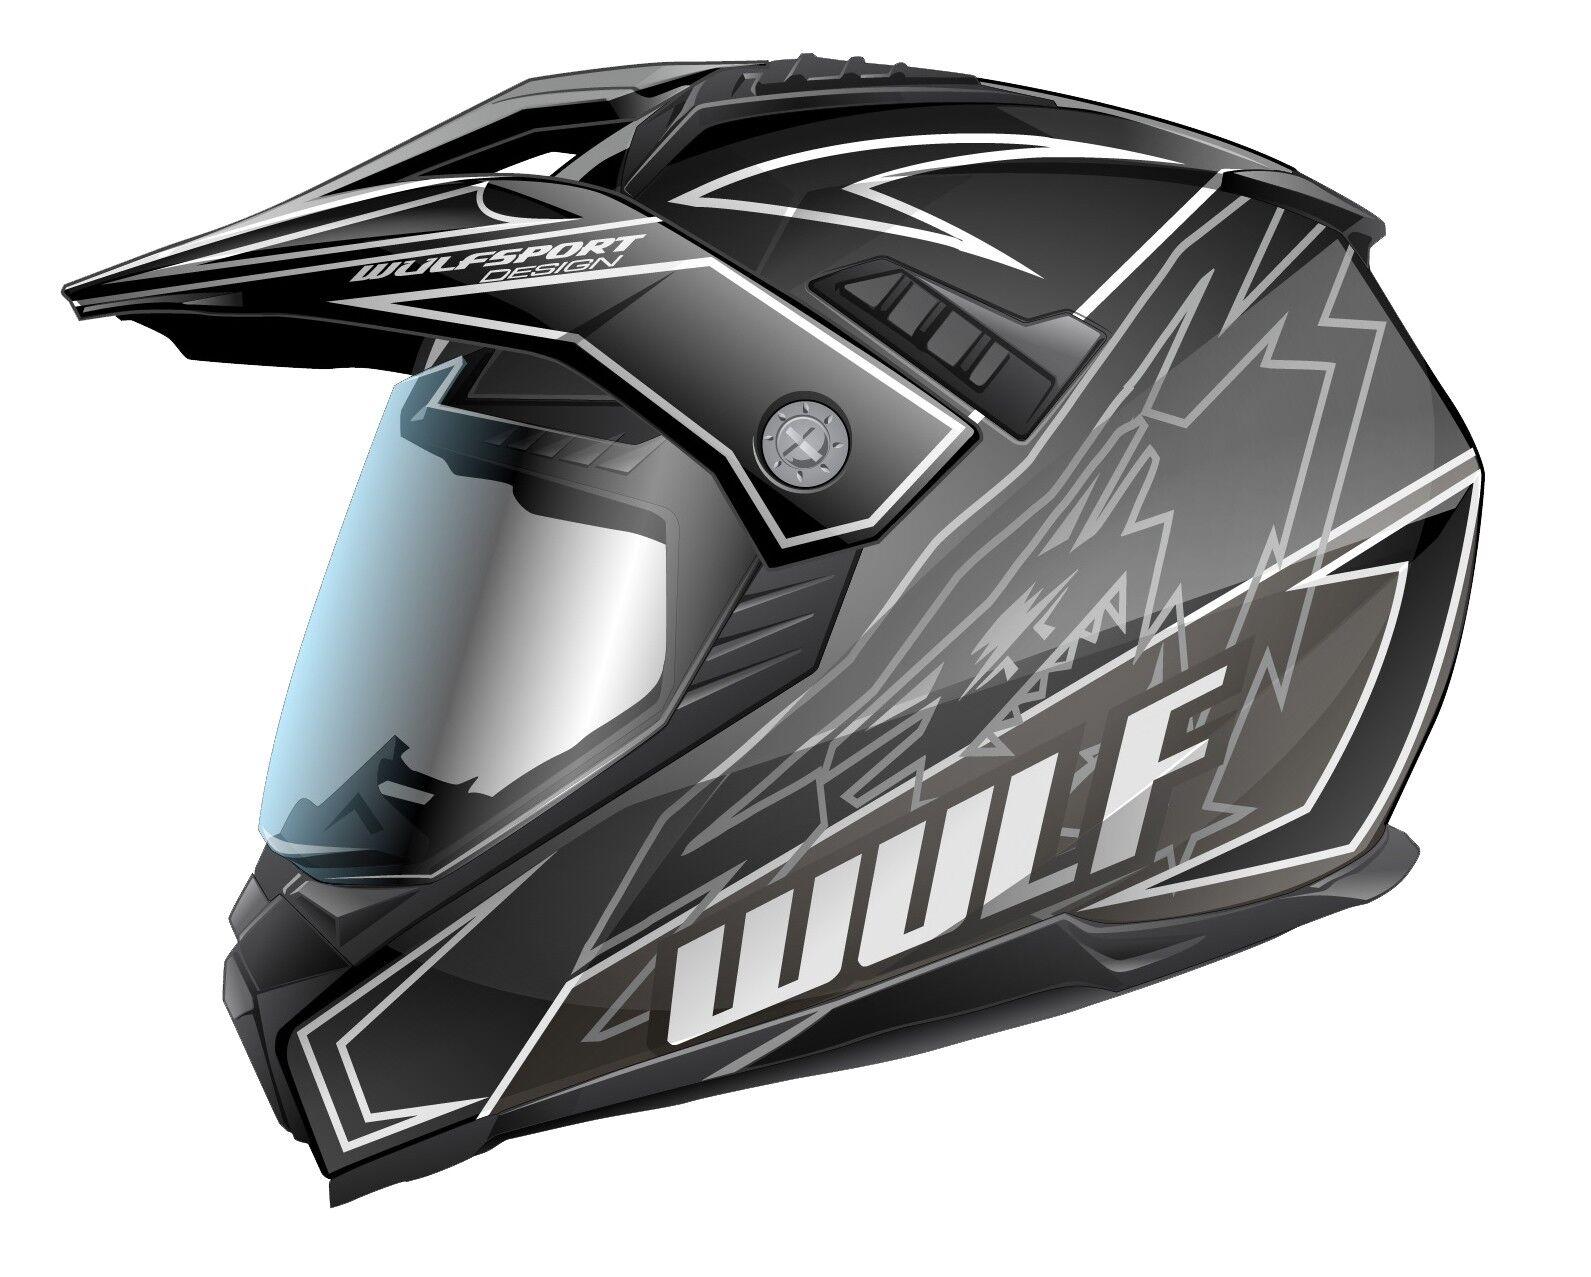 Wulfsport Prima-X Cross Helm M (57-58cm) schwarz Motorrad Quad Fahrrad Enduro BMX